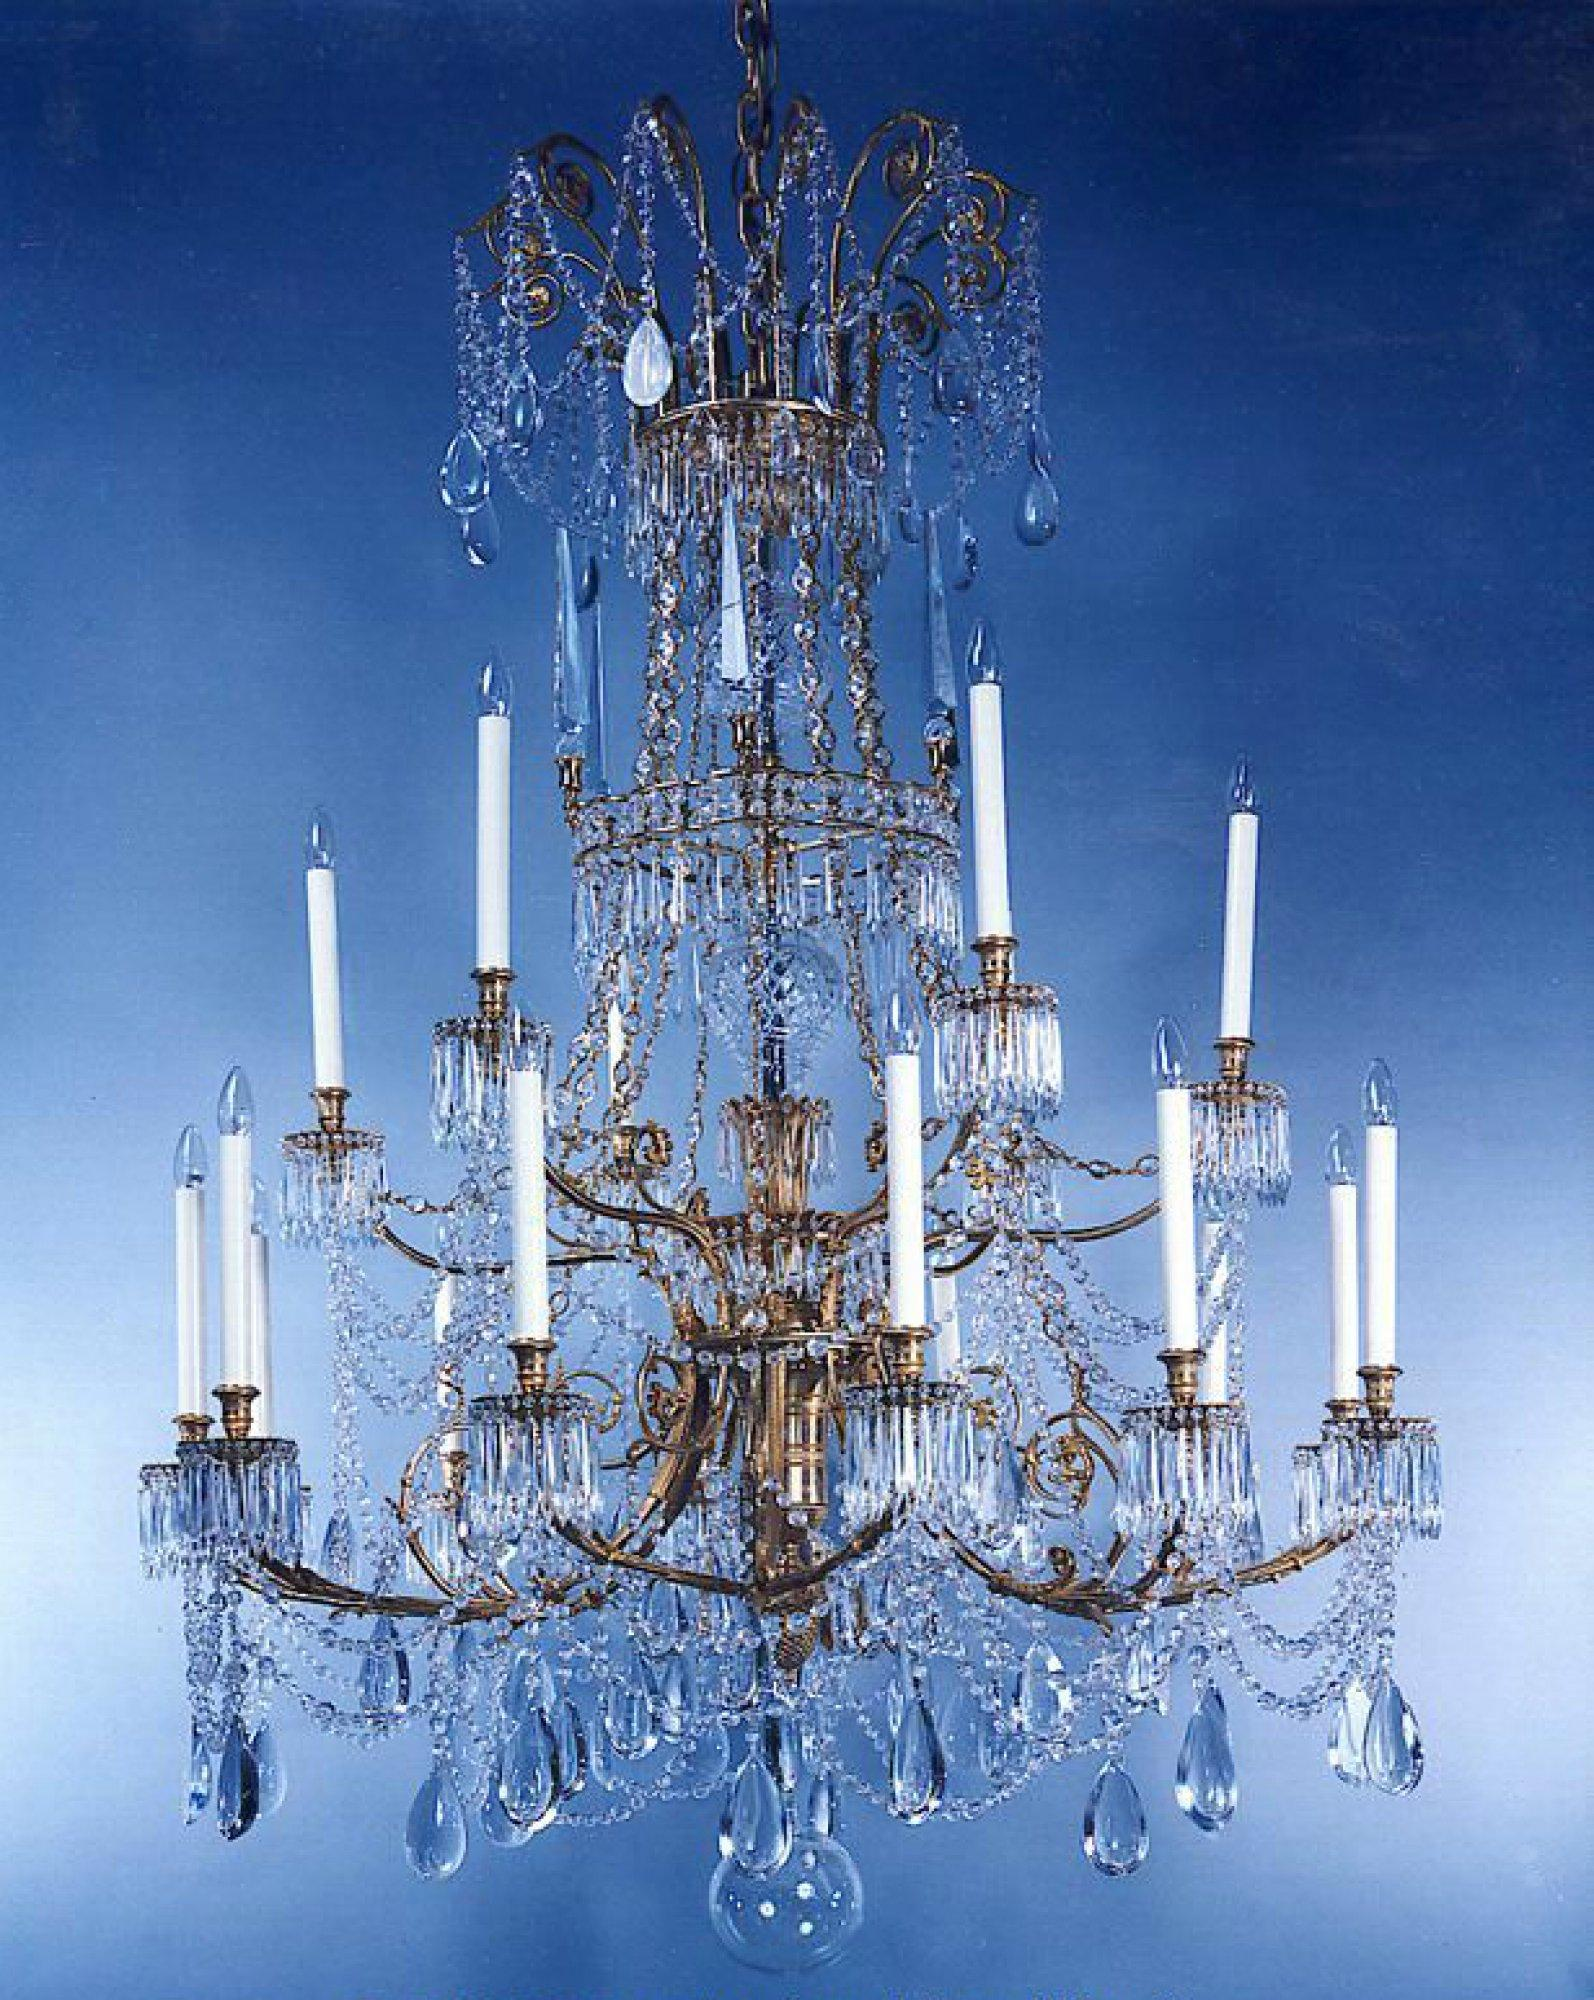 Marie-Antoinette chandelier